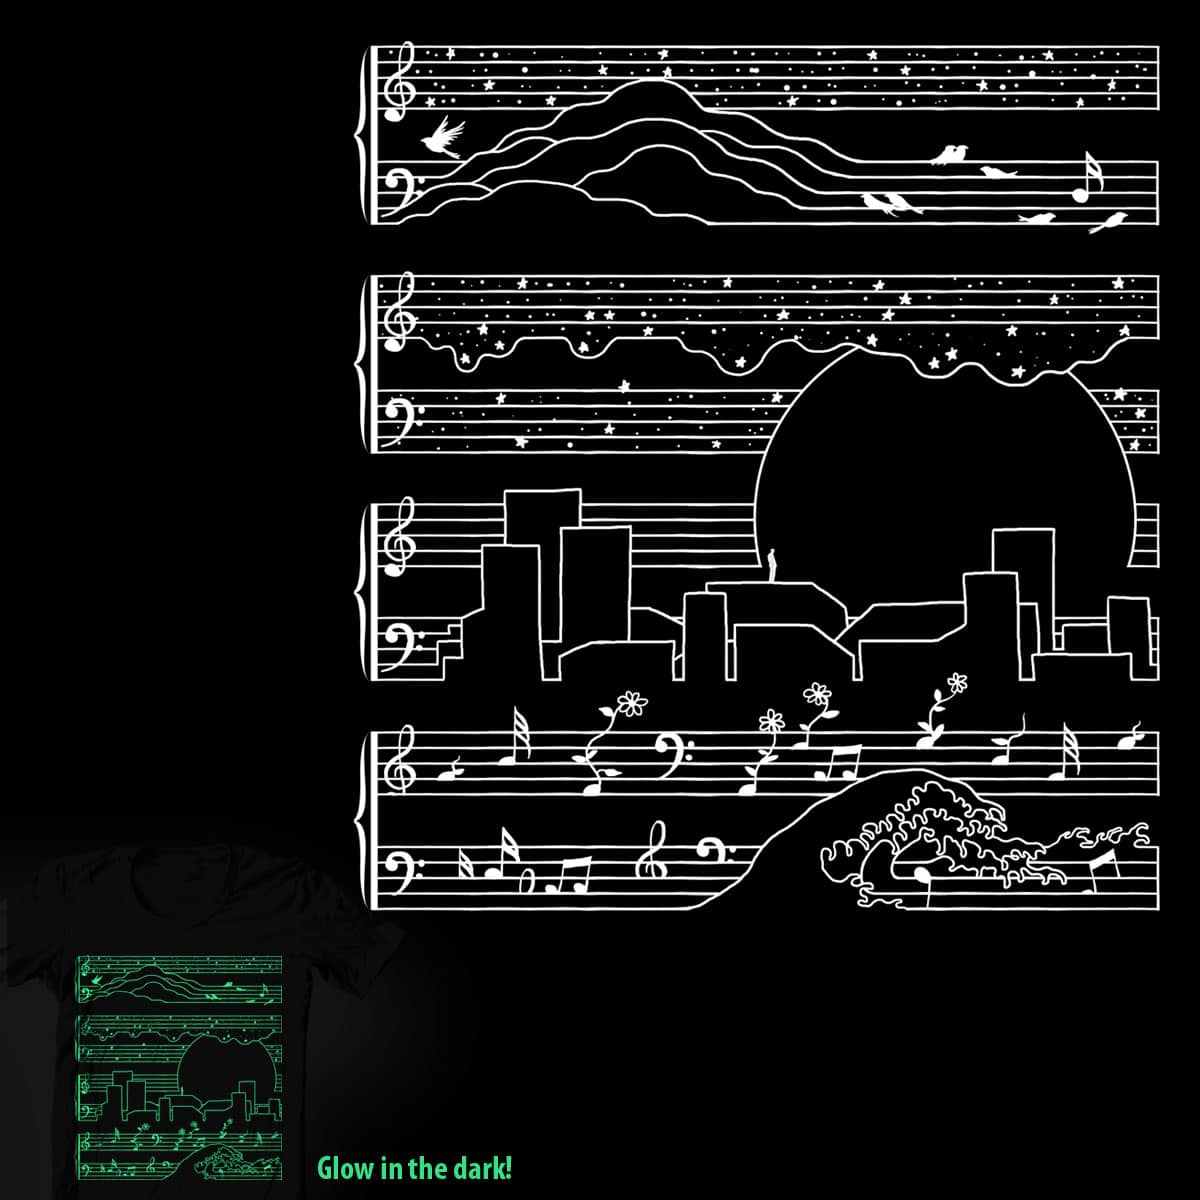 The Moonlight Sonata by tobiasfonseca on Threadless